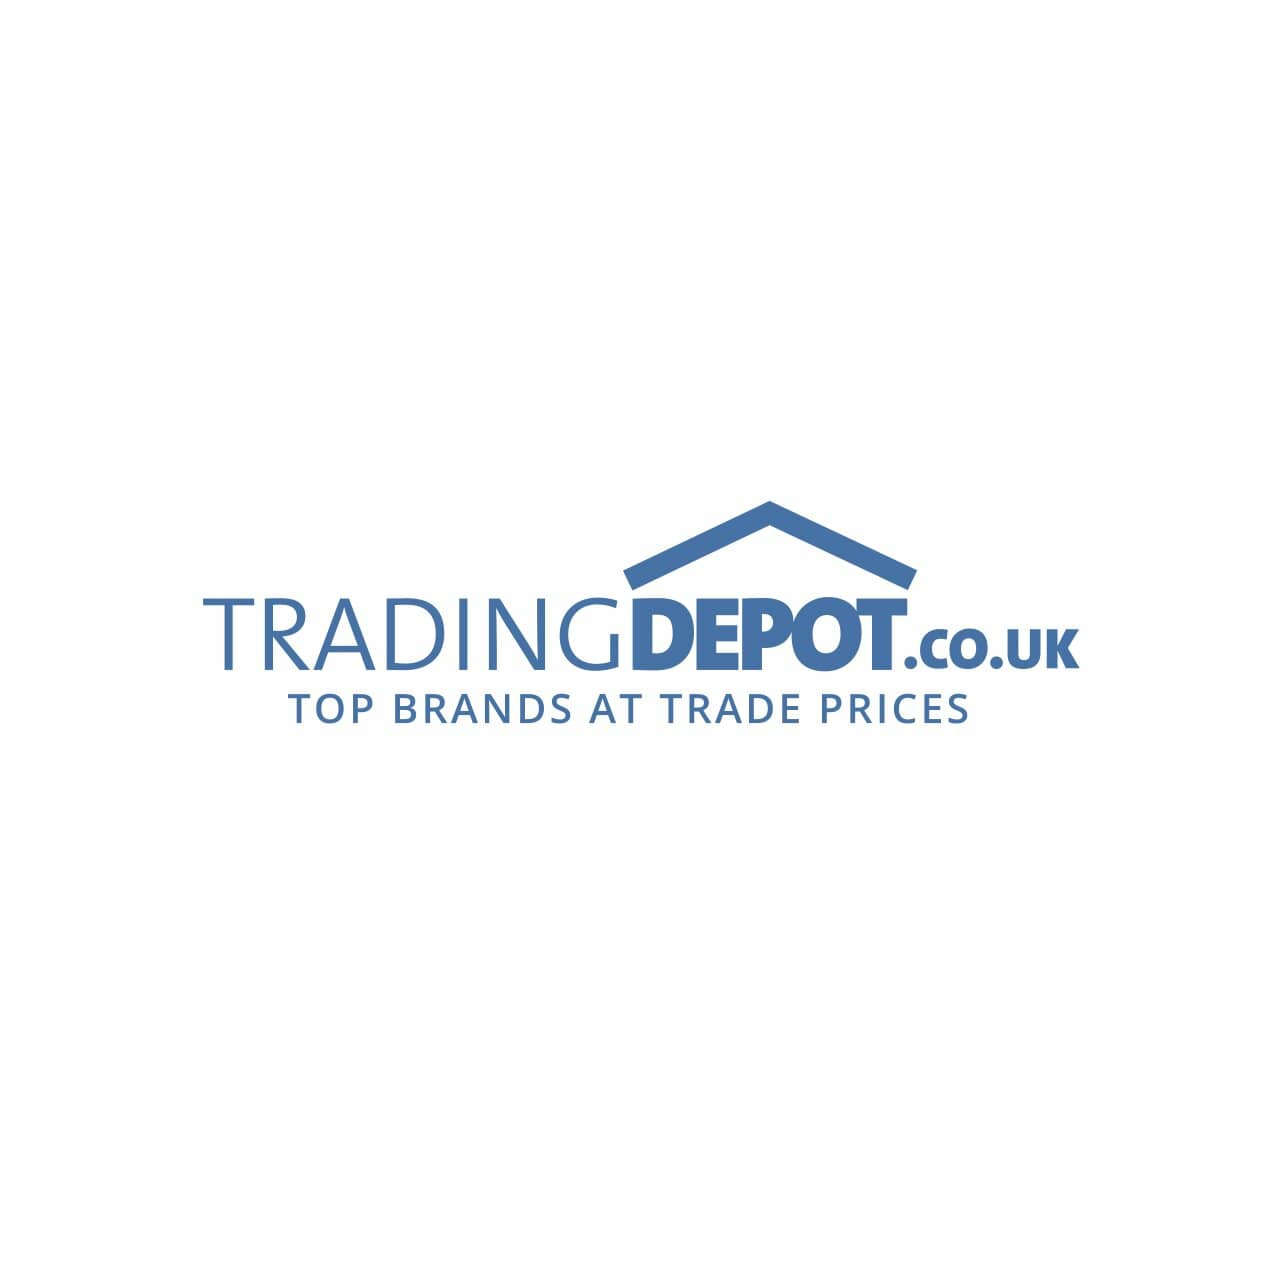 Trading Depot Image